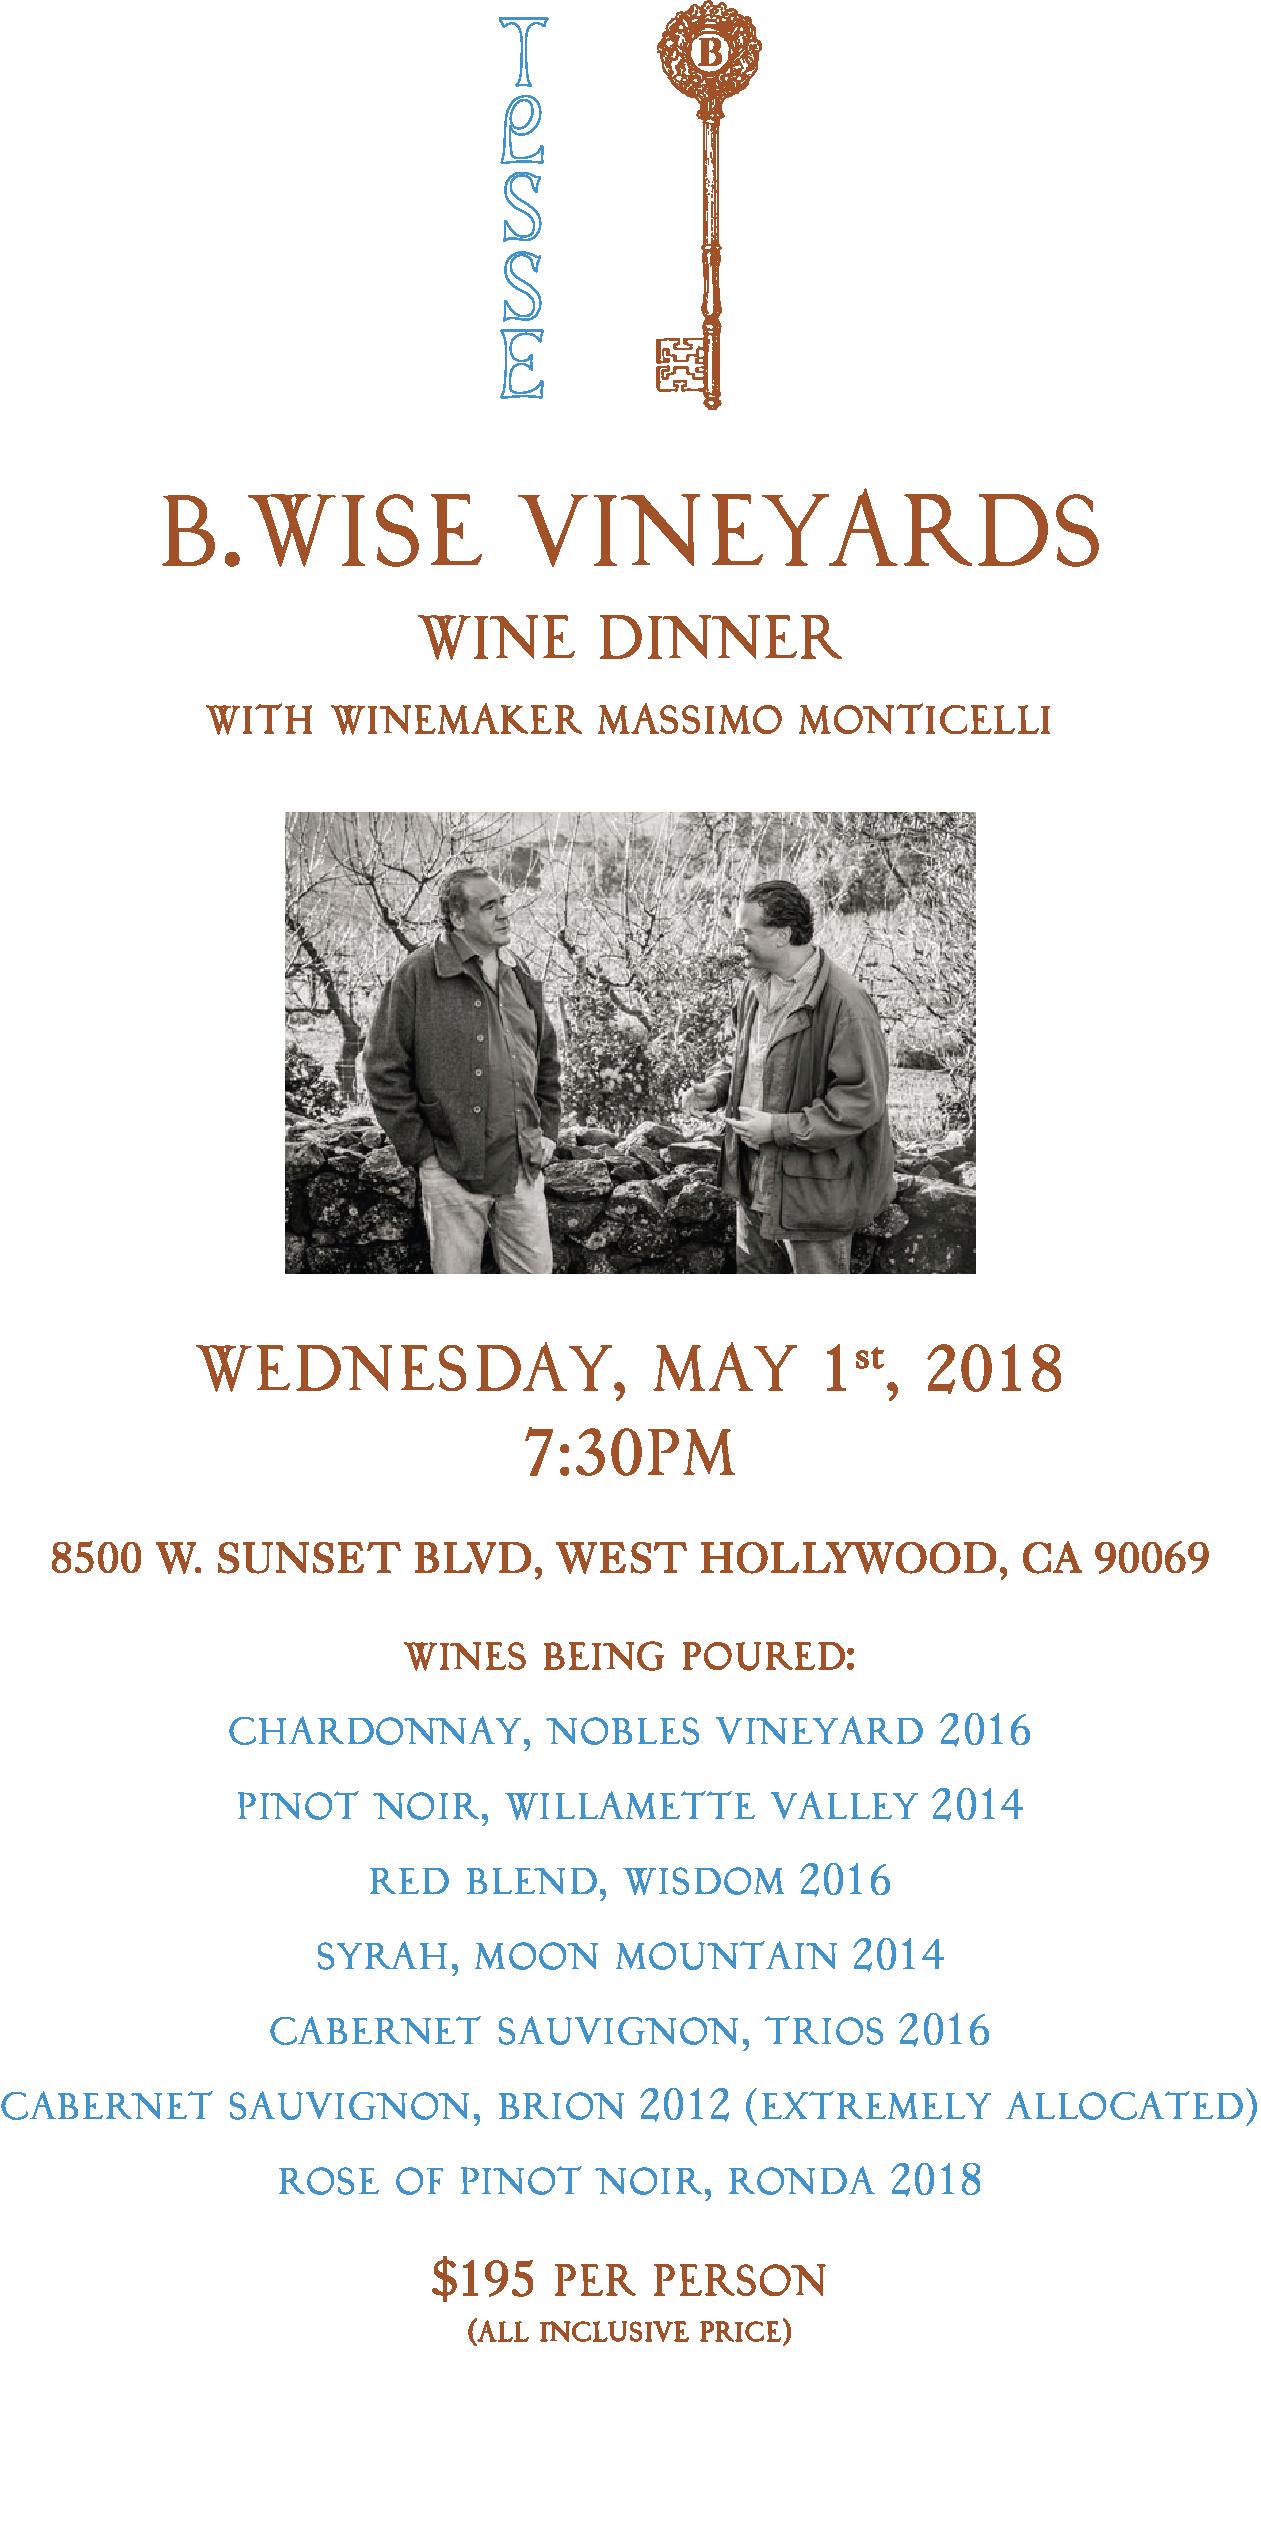 B.Wise Vineyards Wine Dinner Invite.png